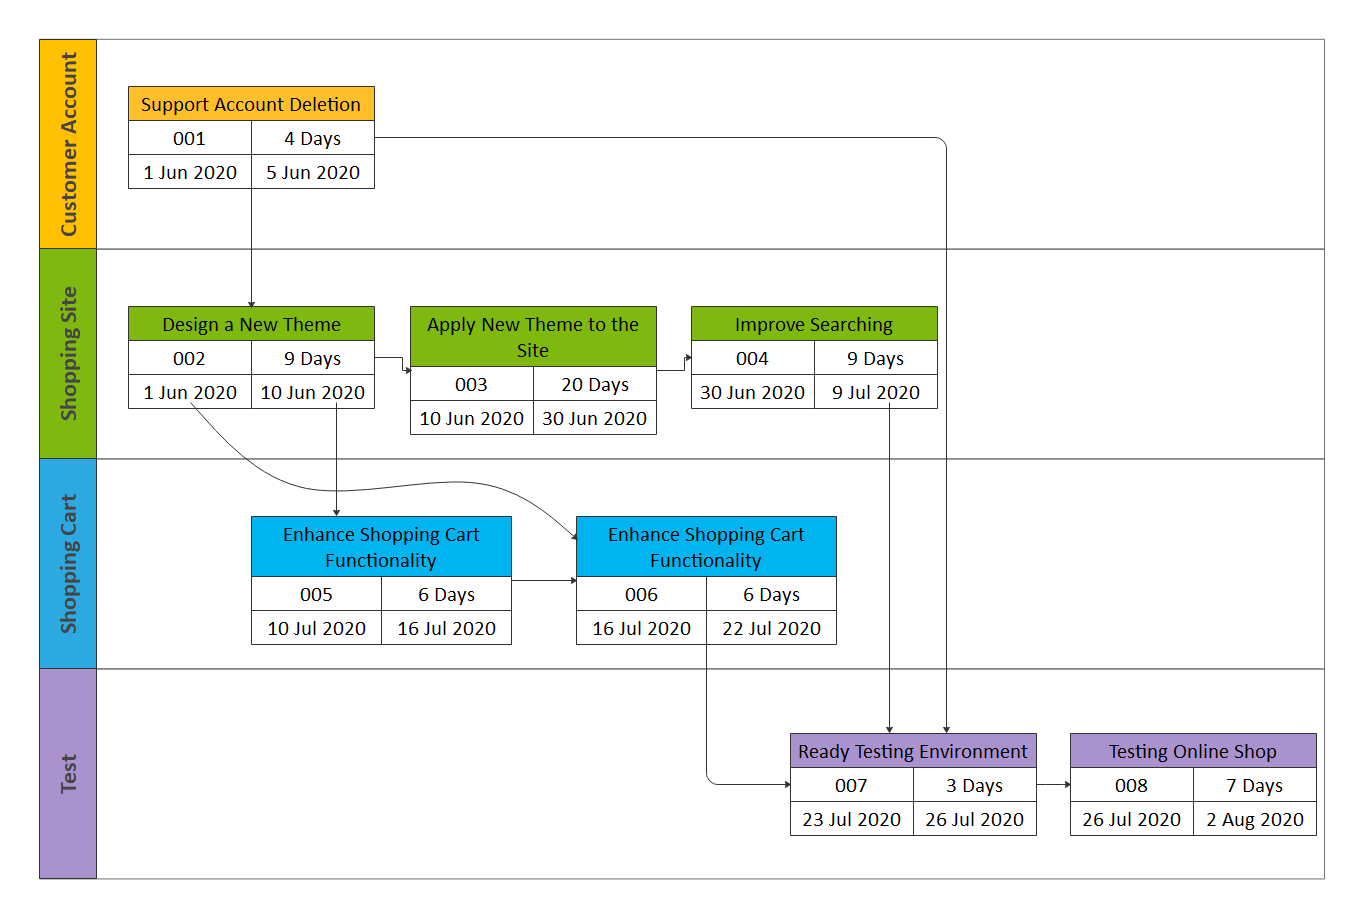 PERT Chart Critical Path